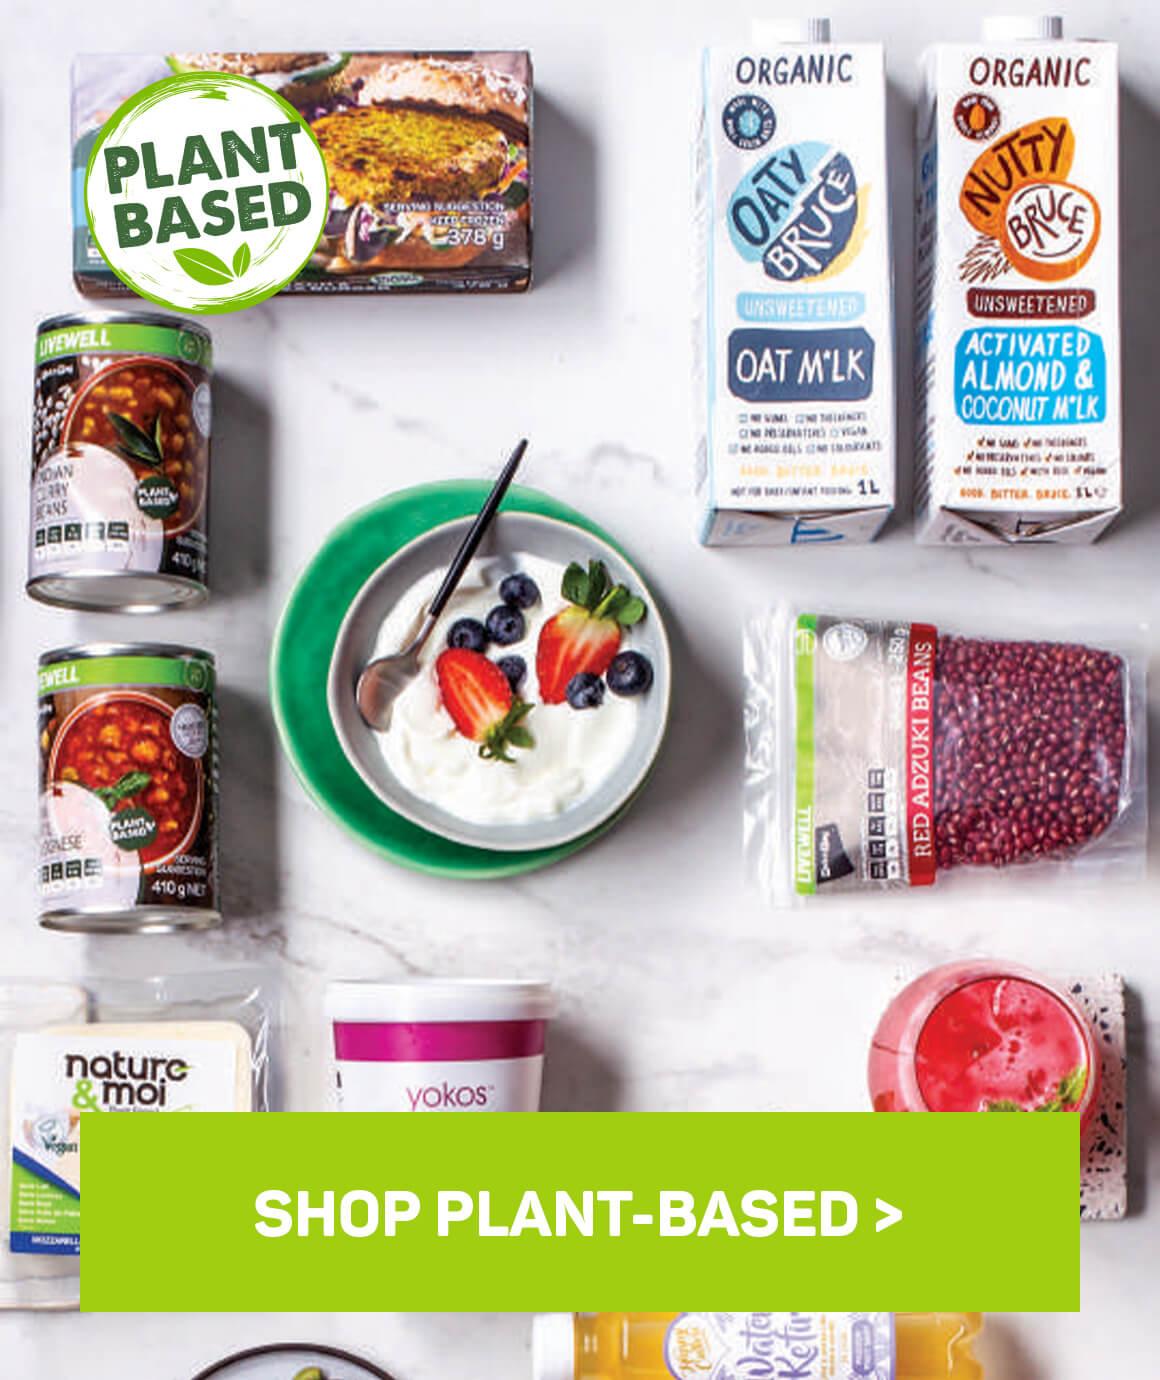 Shop plant-based